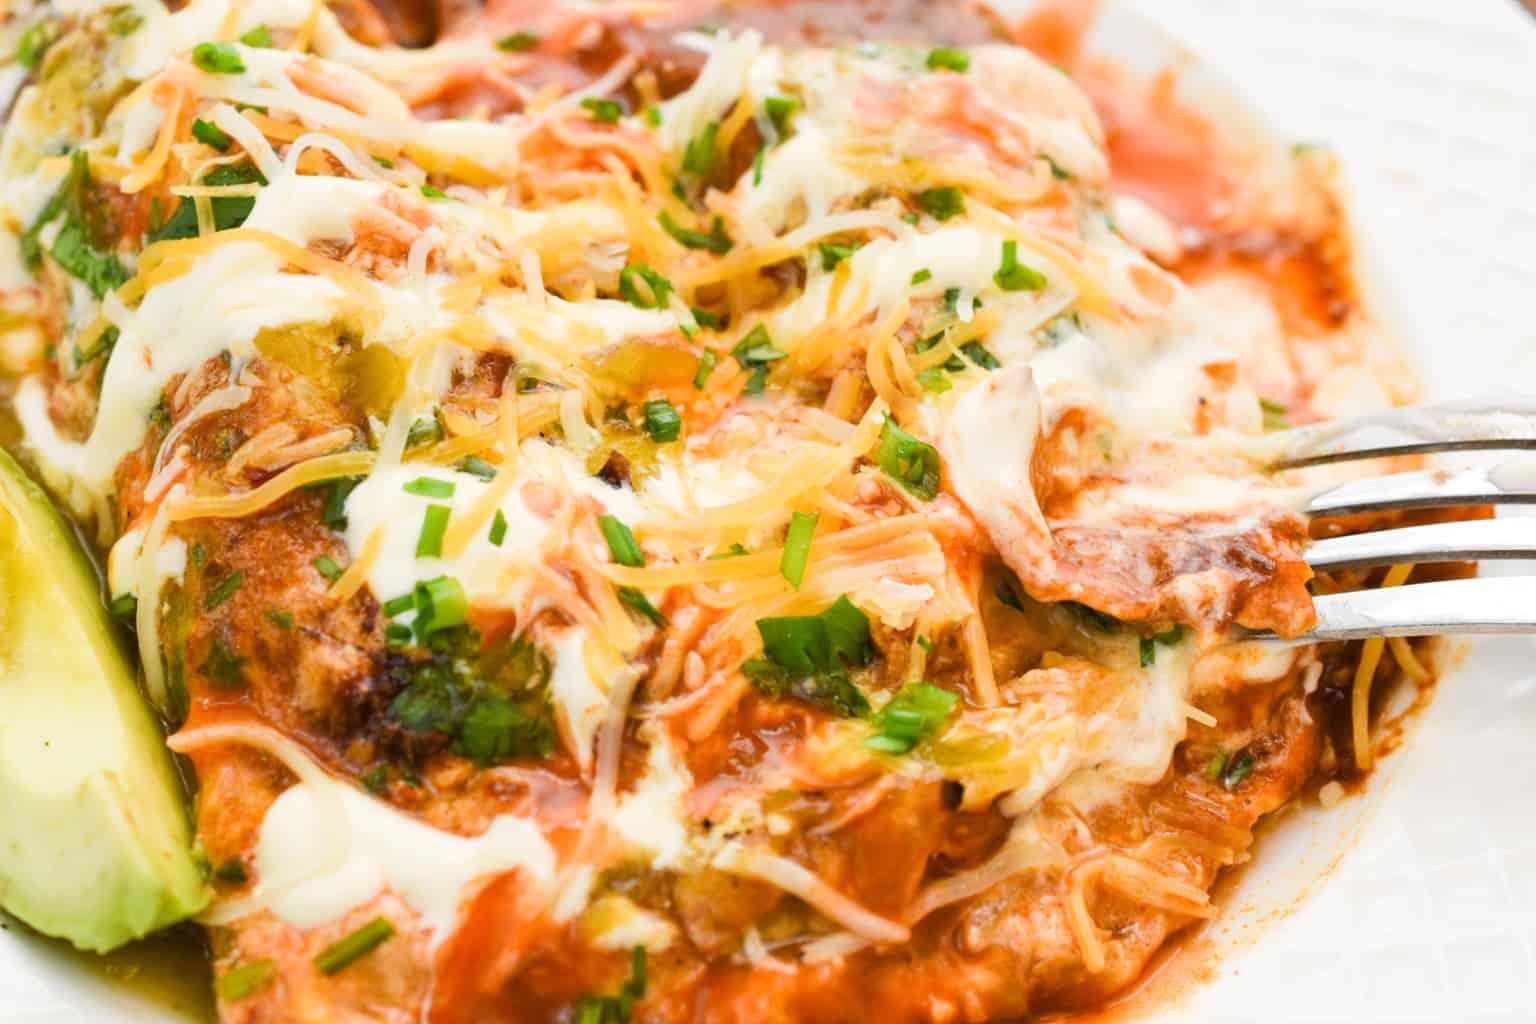 keto chicken enchiladas close up served on a white plate